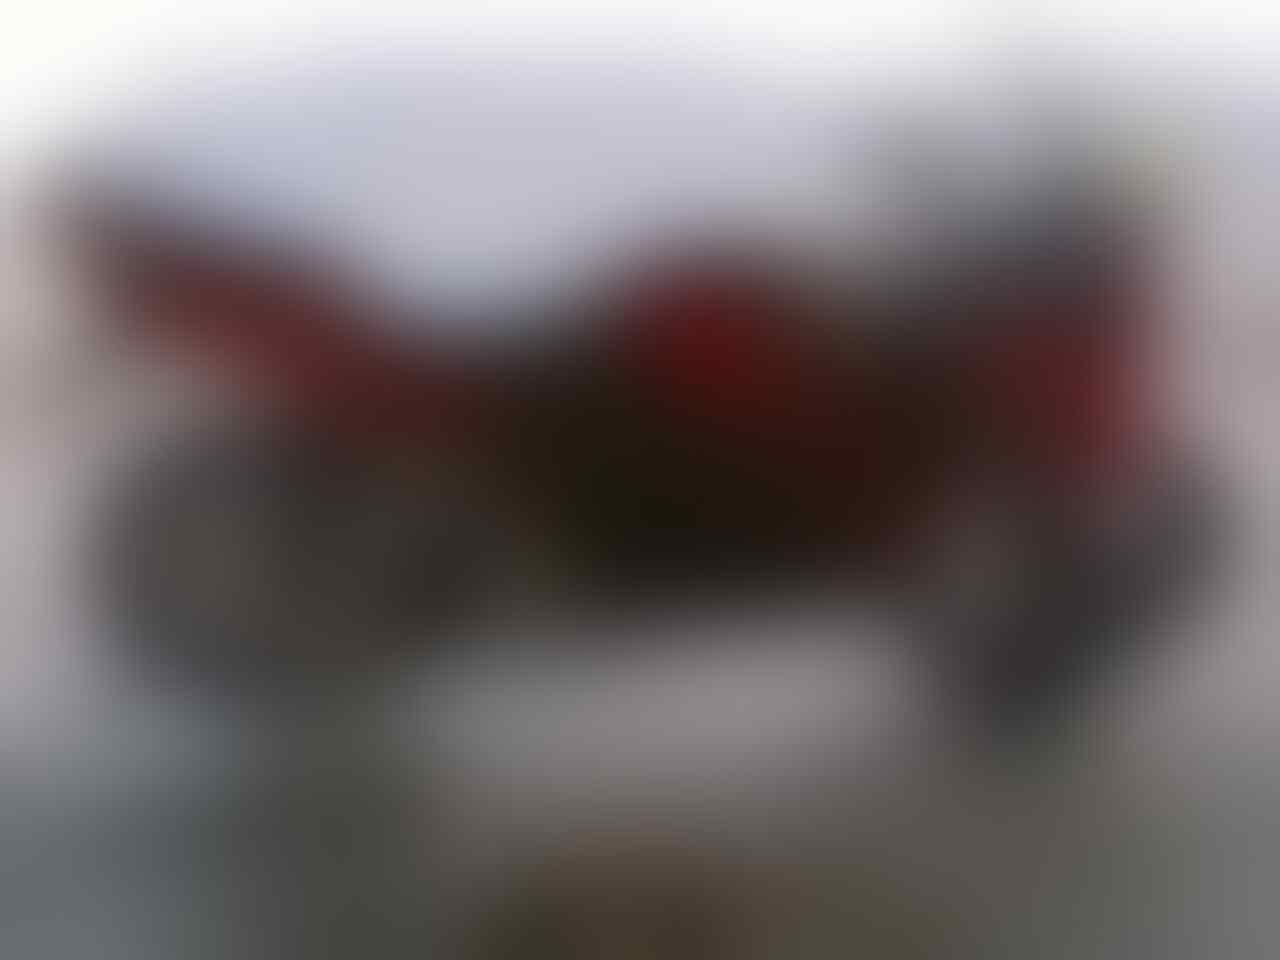 Warteg Warung Jual Beli Barang Jasa Regional Tegal All New Cbr 150r Racing Red